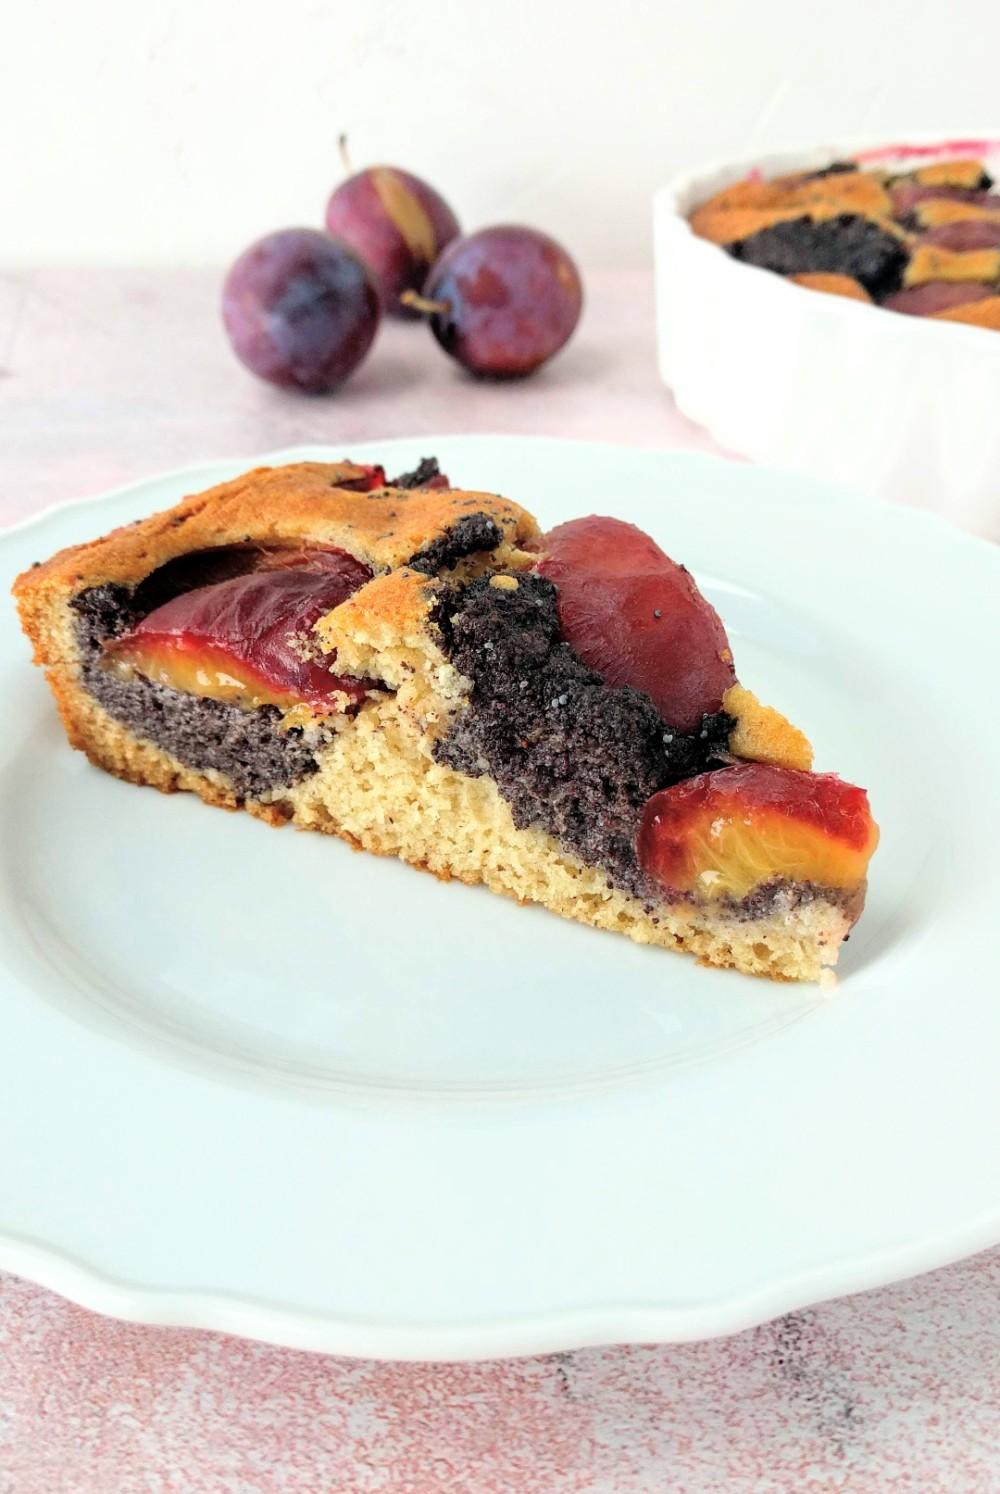 slivkovo-makový bezlepkový koláč